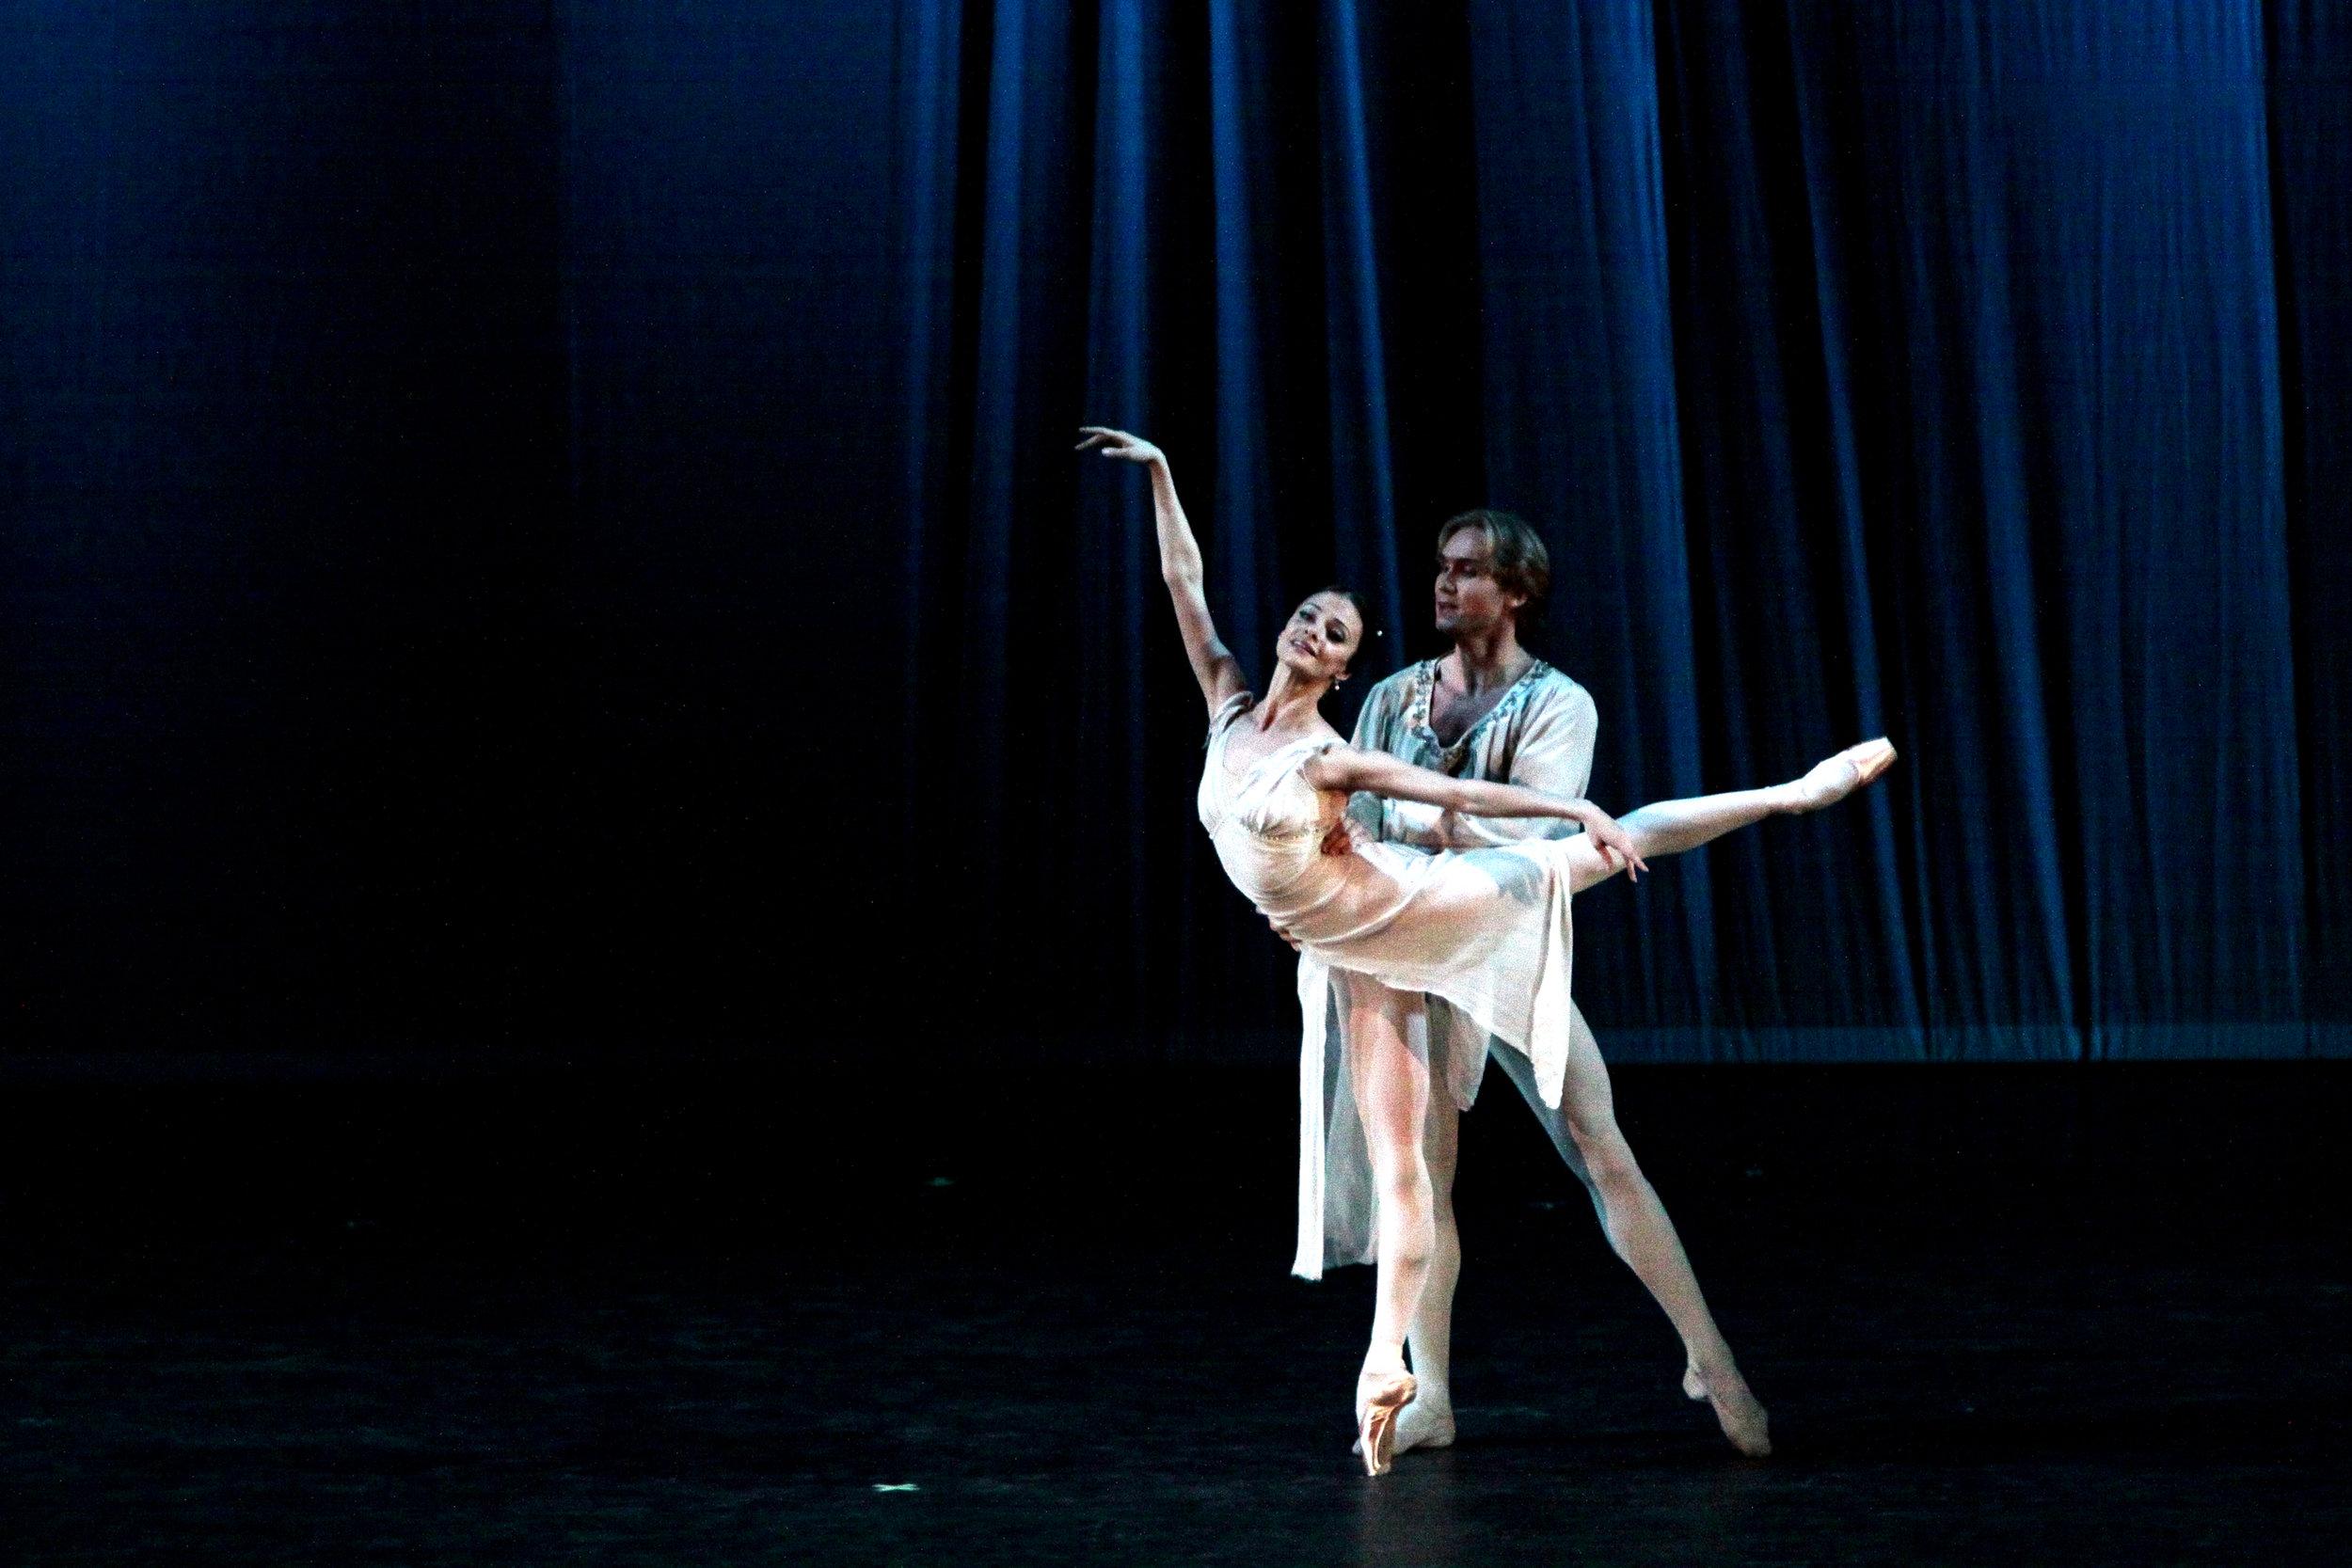 Yana Selina, soloist of the Mariinsky Ballet, and Mikhail Lobukhin, principal dancer of the Bolshoi Theatre Ballet Company, perform the    Romeo and Juliet    pas de deux. Photo by Ocs Alvarez, from the Ballet Manila Archives collection